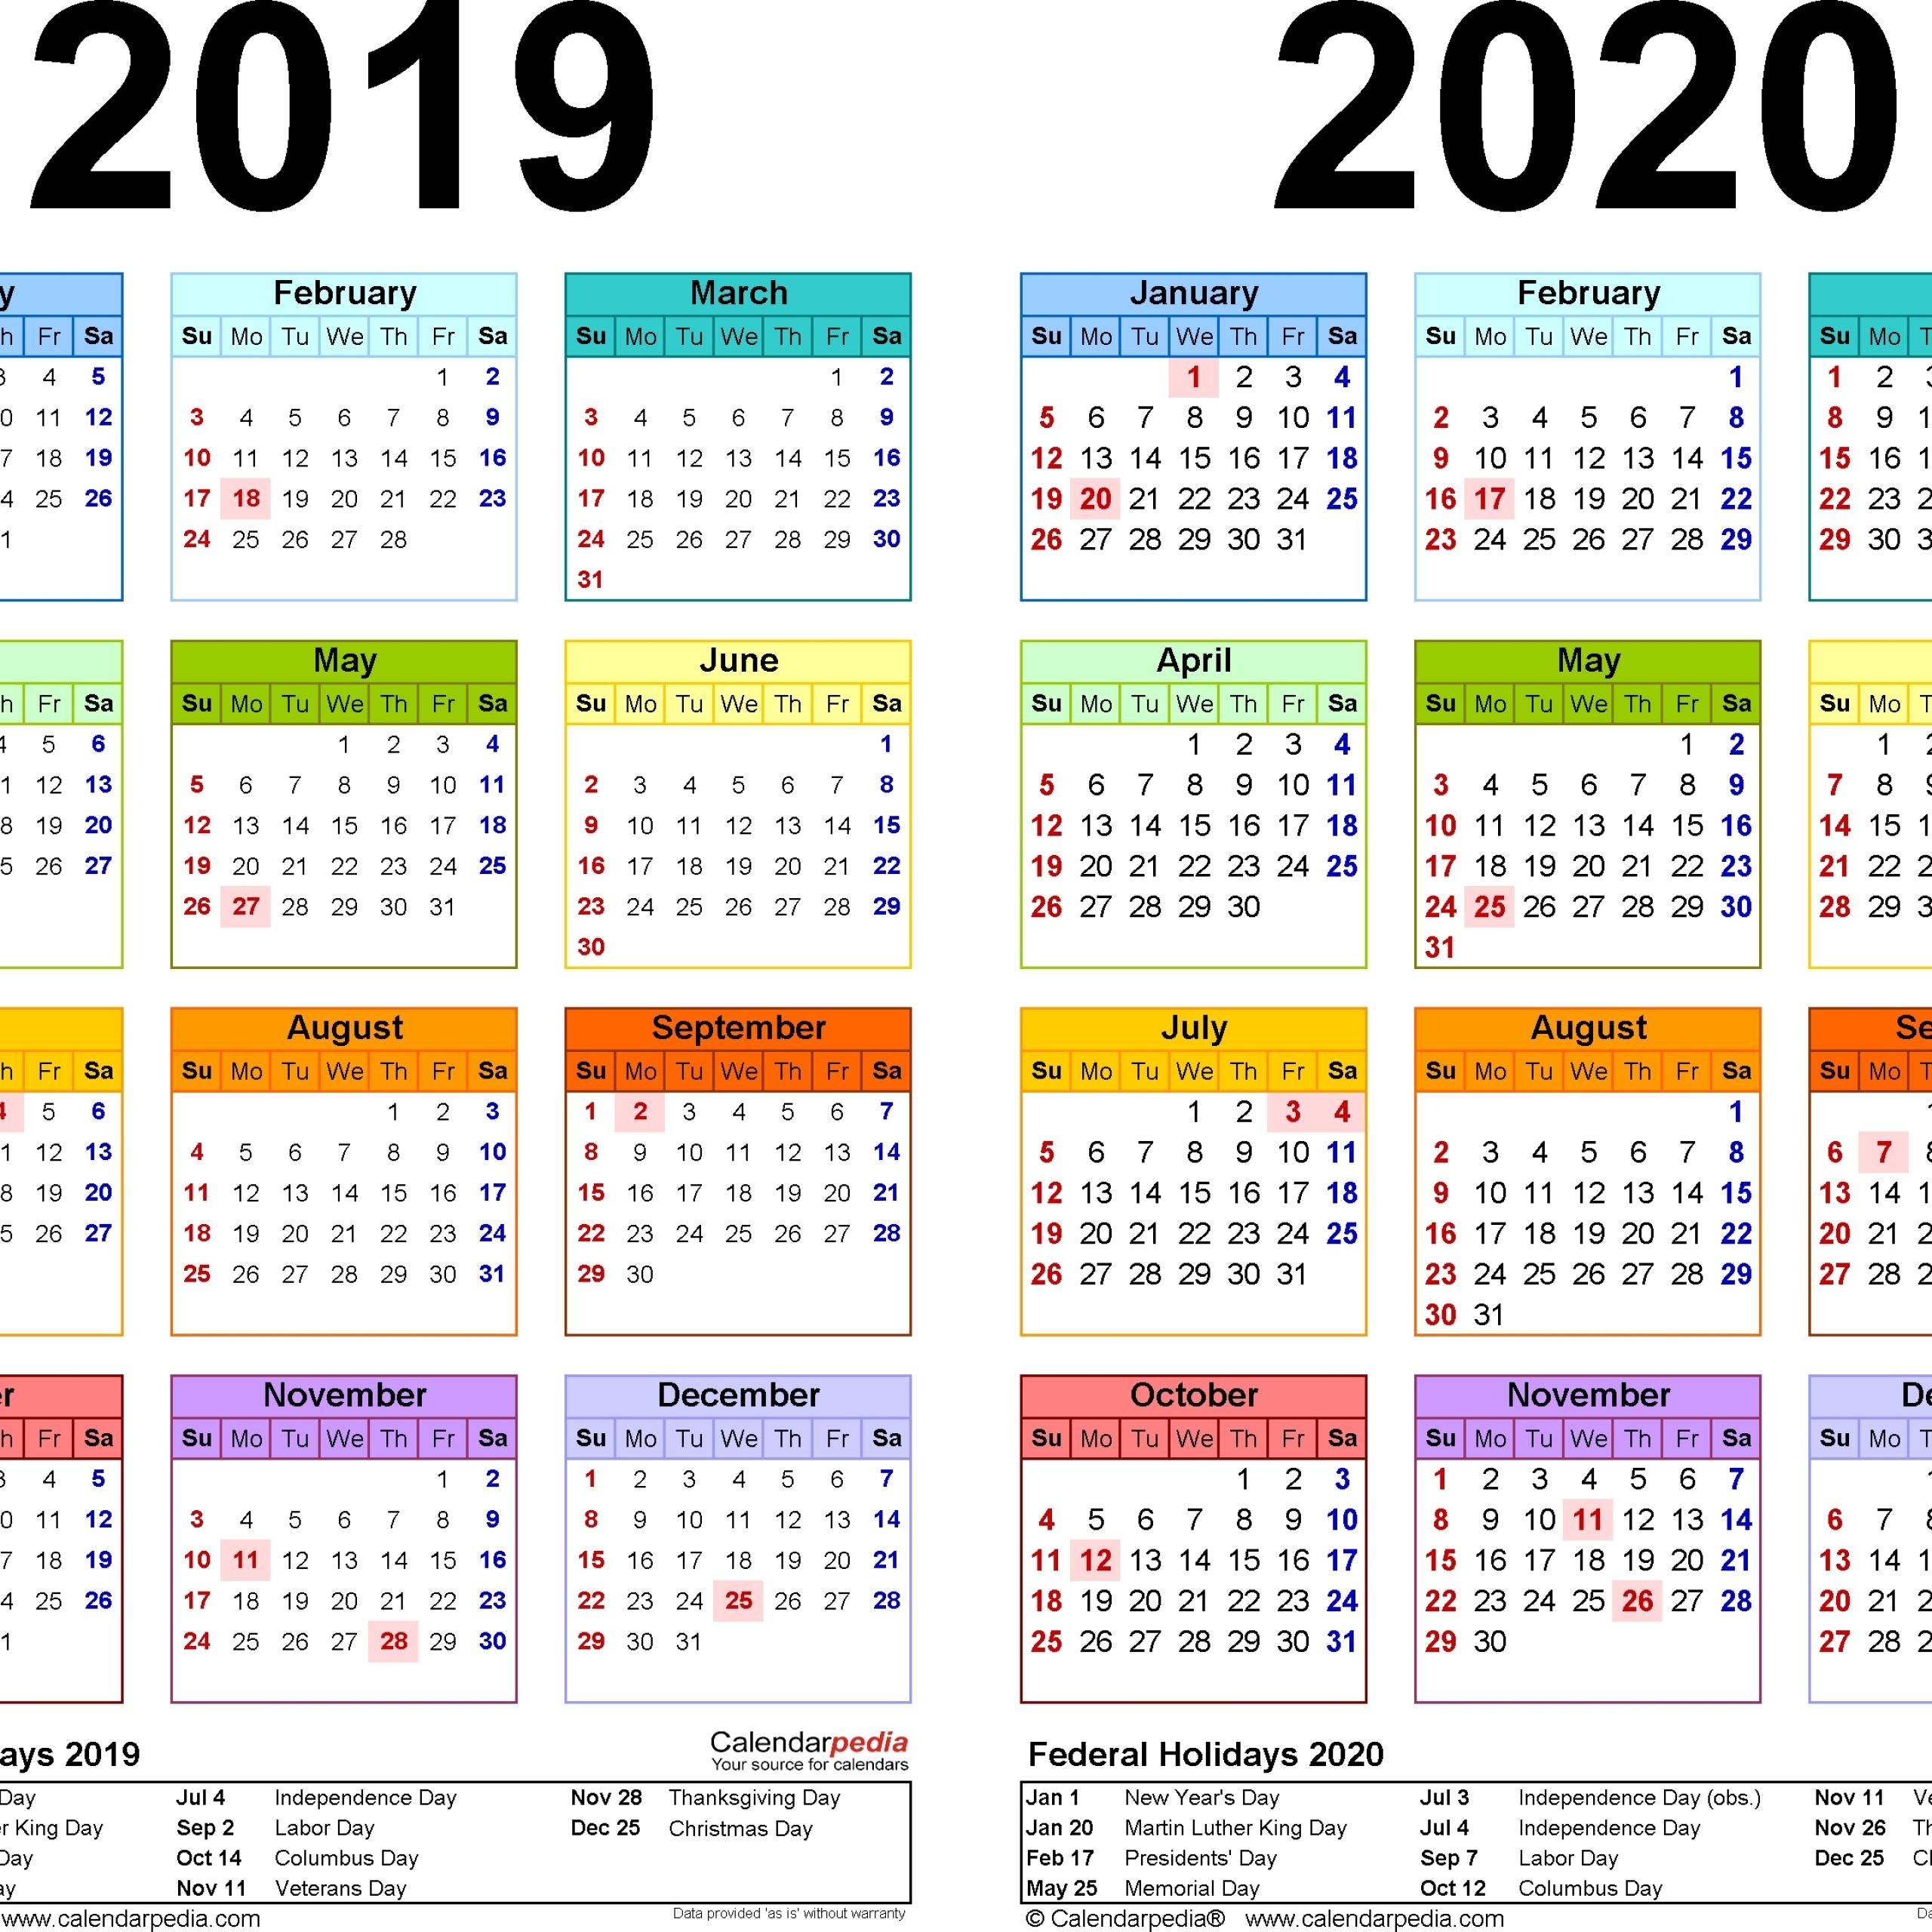 20+ Calendar 2021 Uae - Free Download Printable Calendar